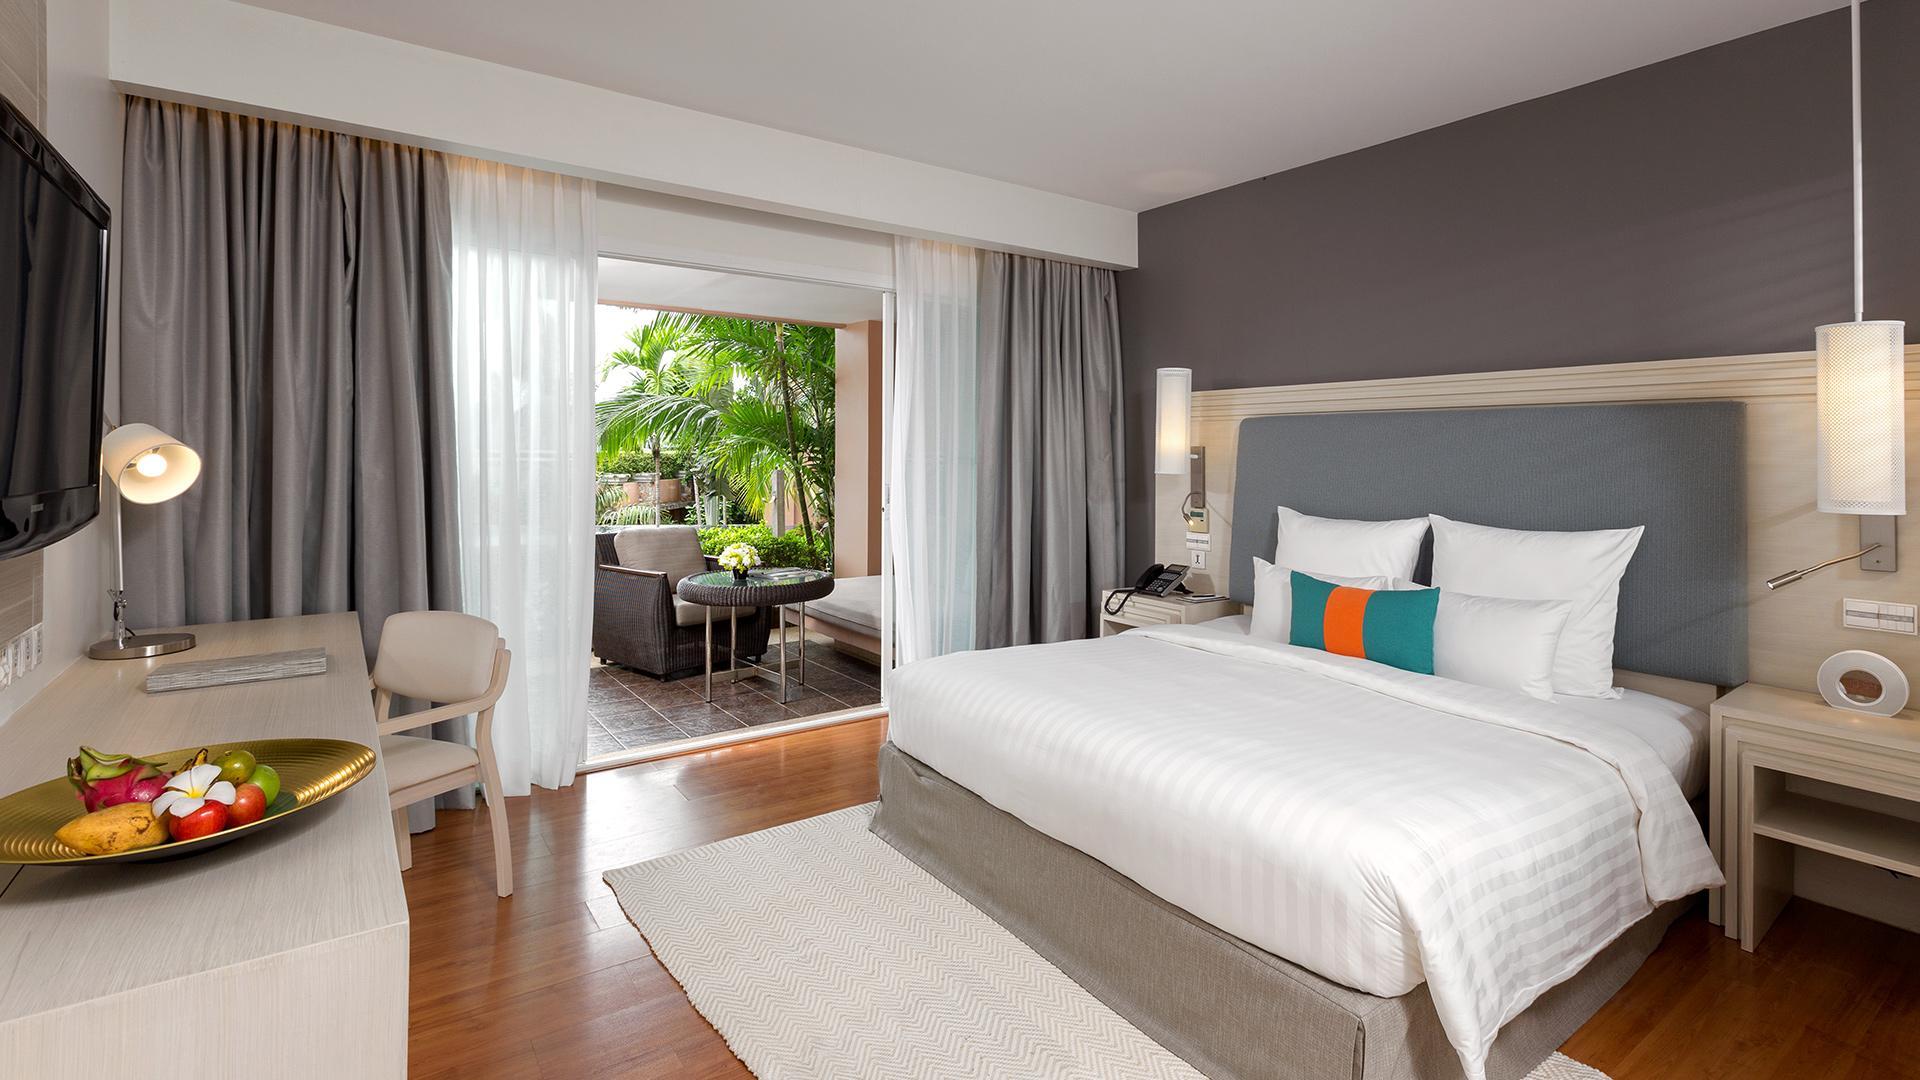 Deluxe Room image 1 at Pullman Phuket Panwa Beach Resort by Amphoe Mueang Phuket, Chang Wat Phuket, Thailand